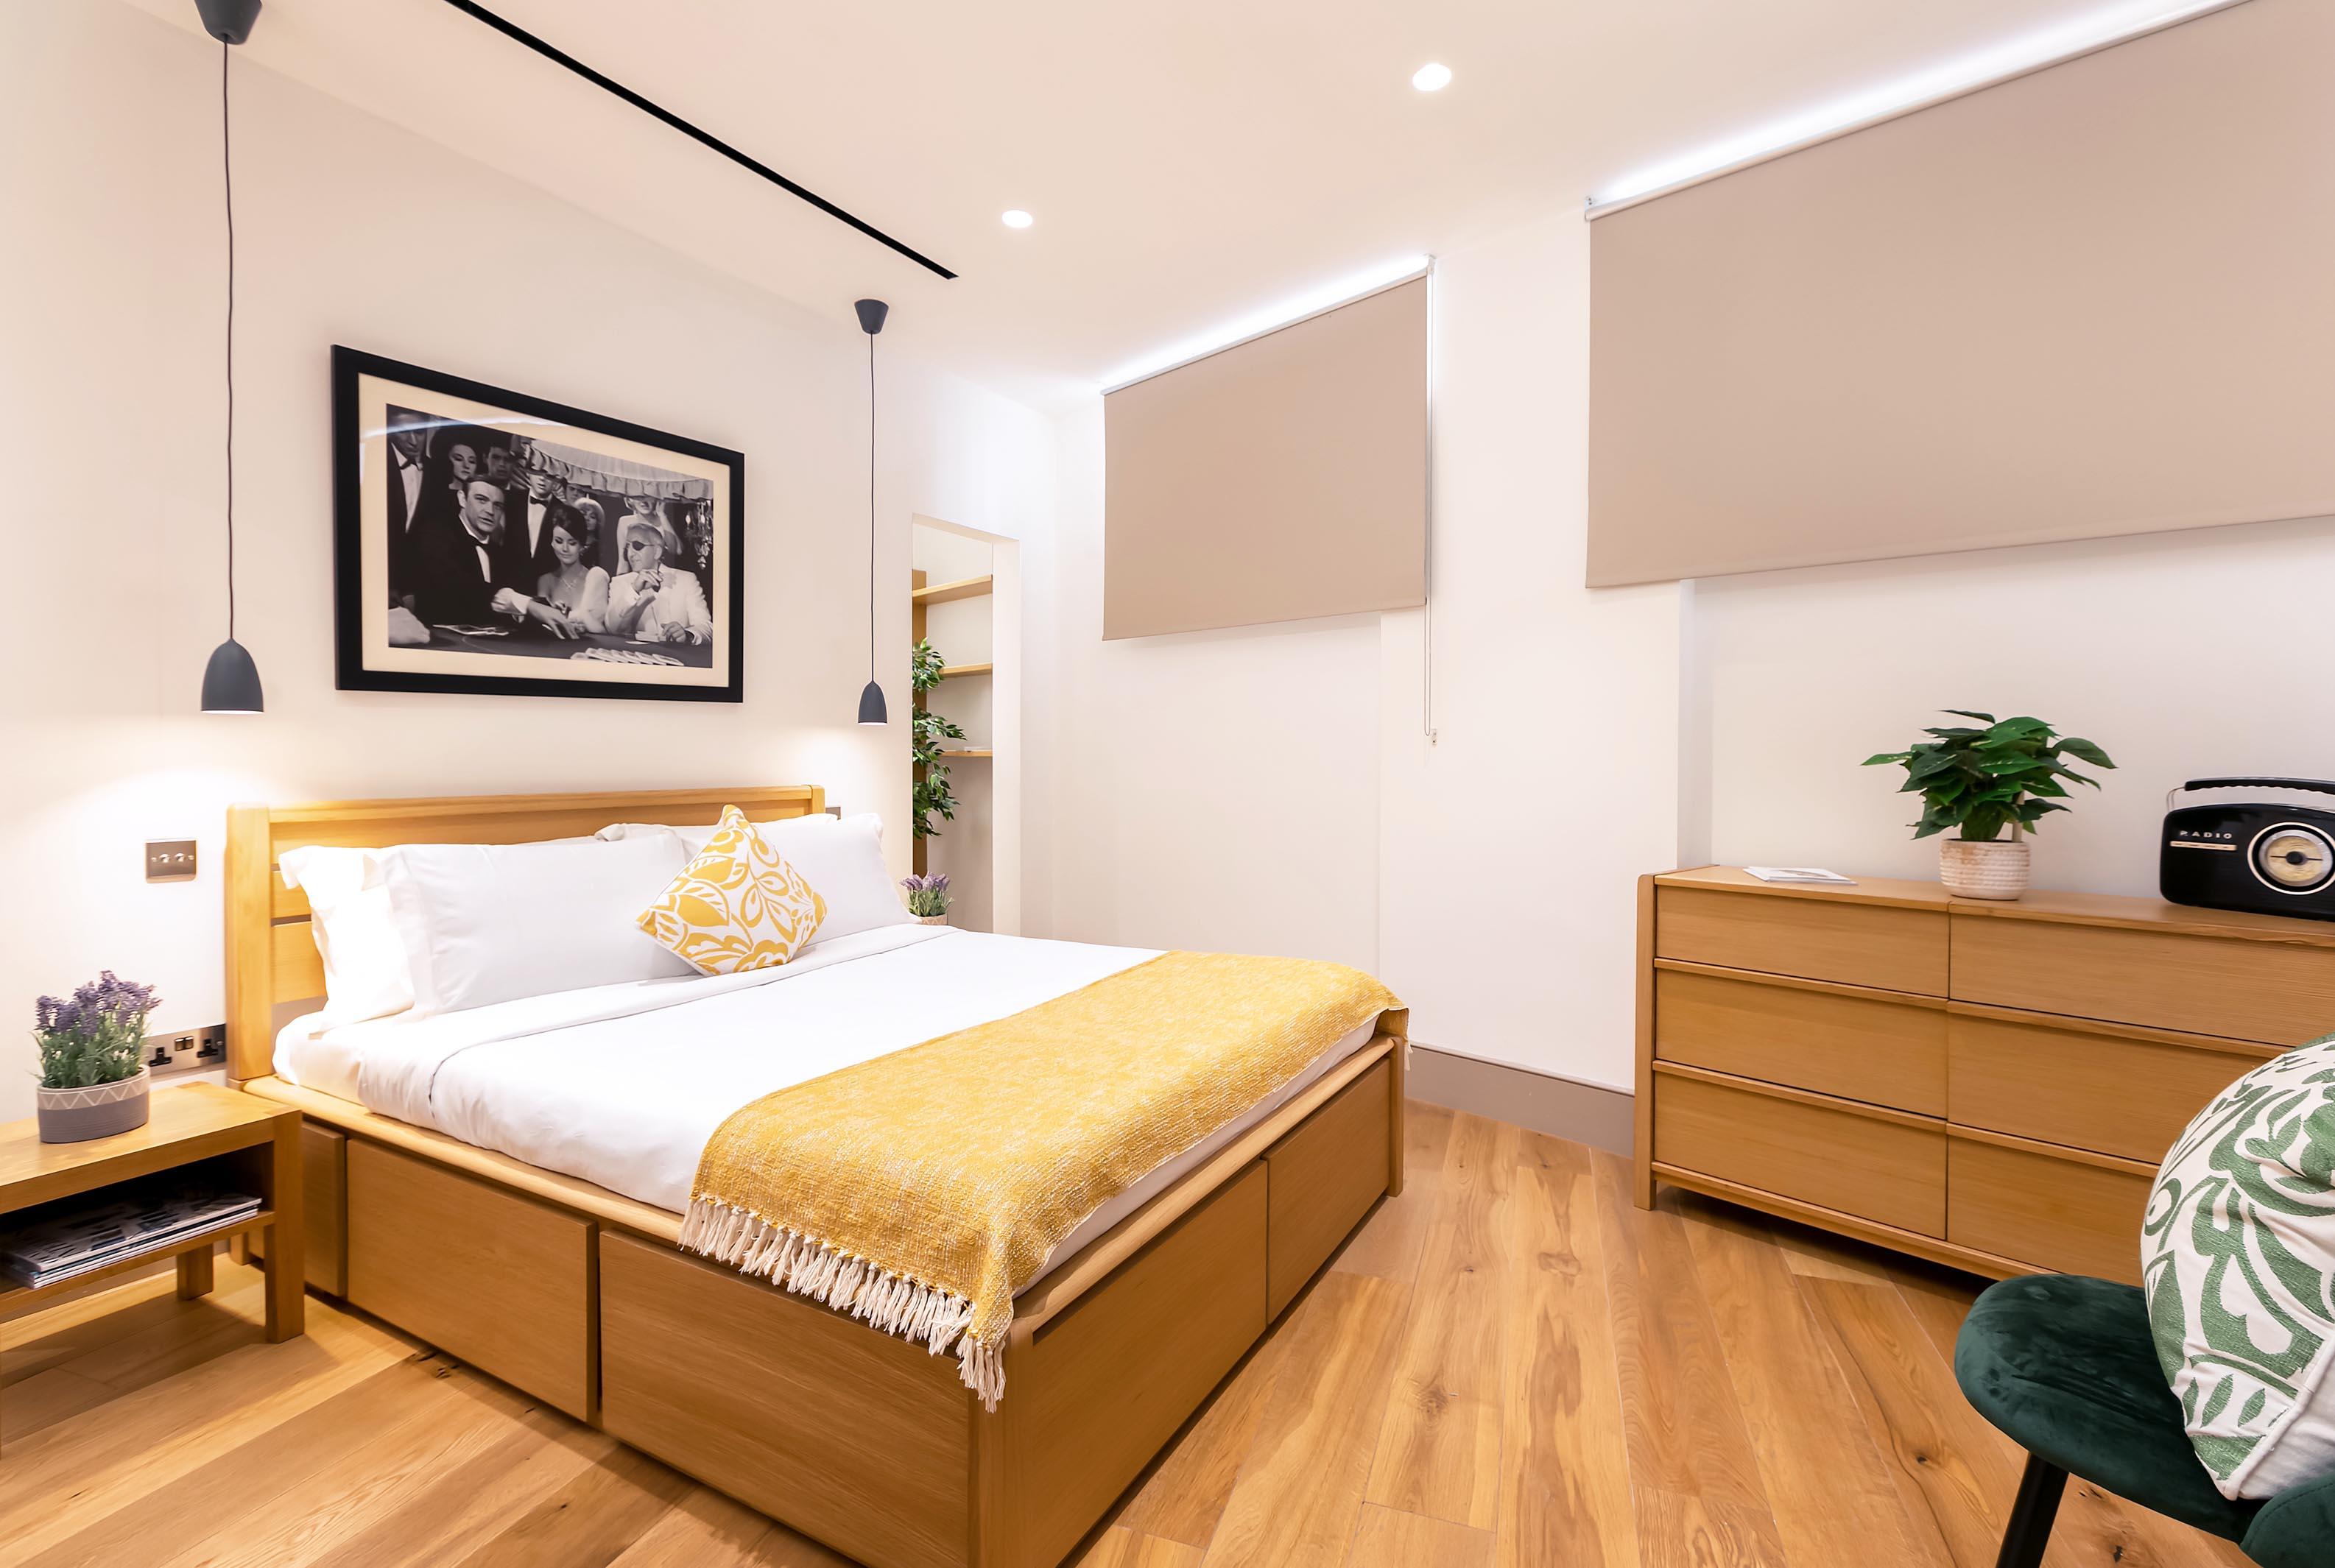 Lovelydays luxury service apartment rental - London - Fitzrovia - Wells Mews B - Lovelysuite - 2 bedrooms - 2 bathrooms - Double bed - 8b3f2c05de6c - Lovelydays